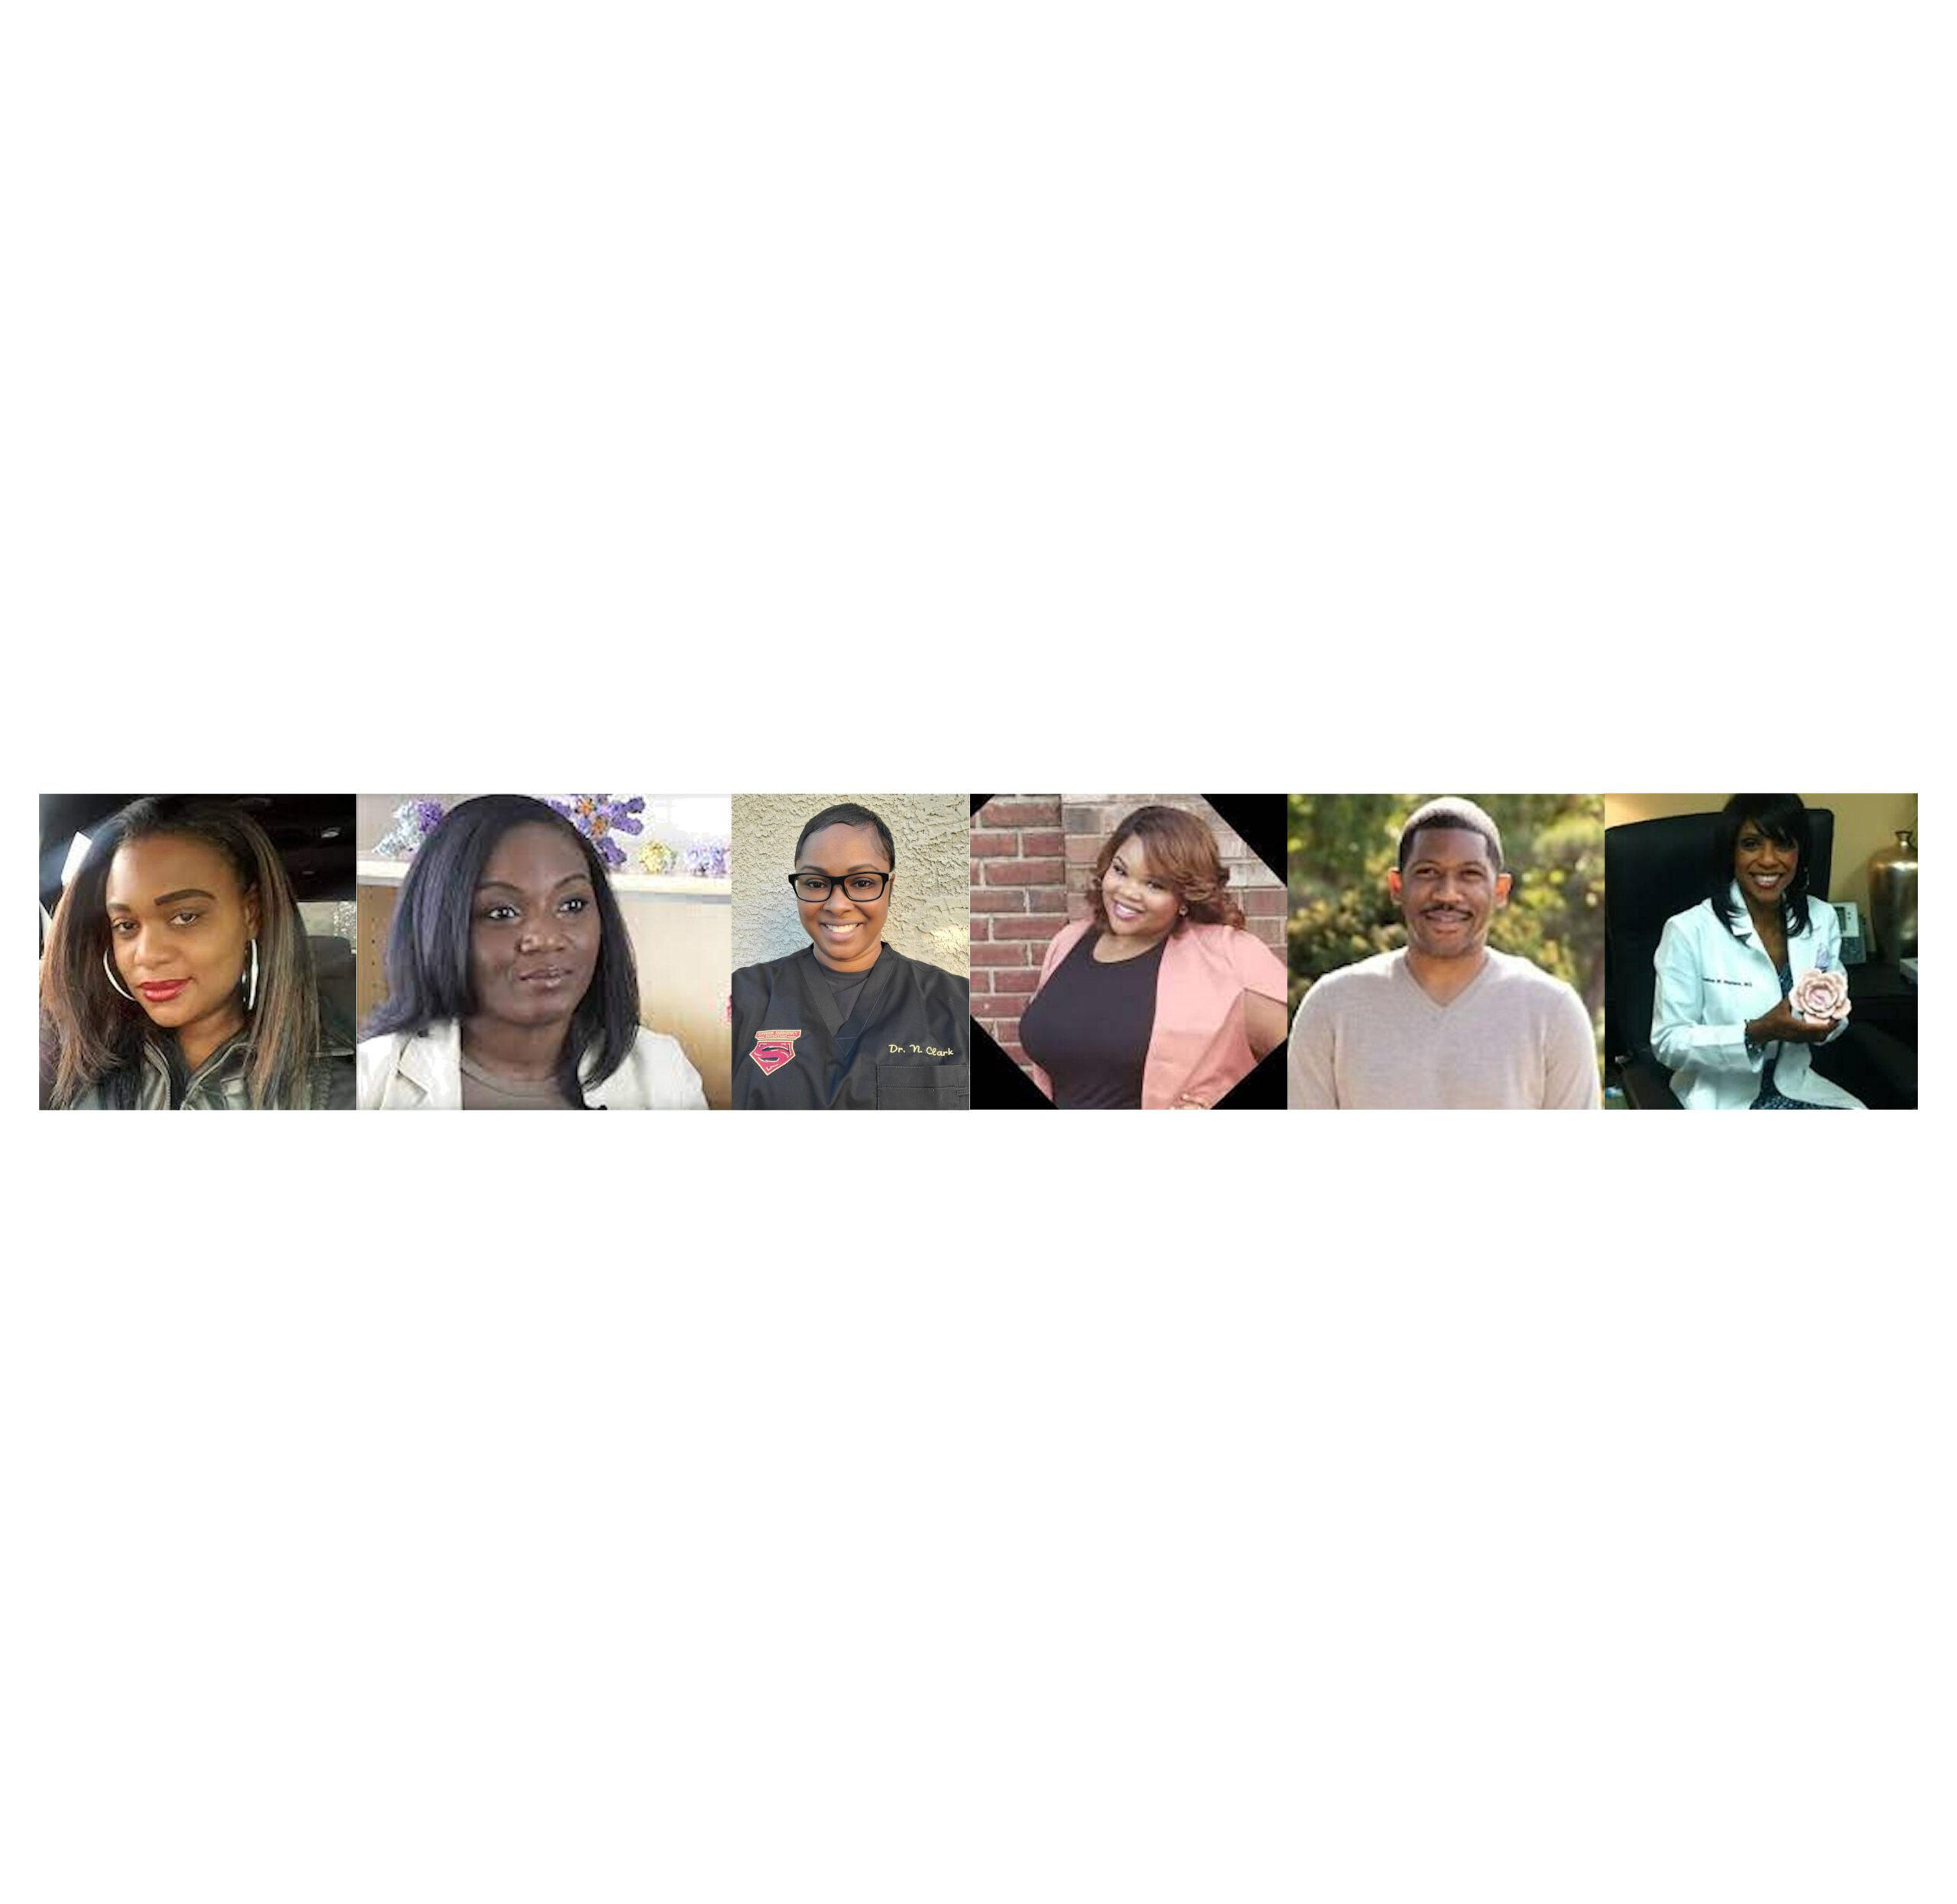 NAACP Moderator and Panelists on COVID: Cherise Jefferson, Dr. Kizzmekia S. Corbett, Dr. Neljah Clark, Dr. Jabril Johnson, Dr. Jacqueline Walters